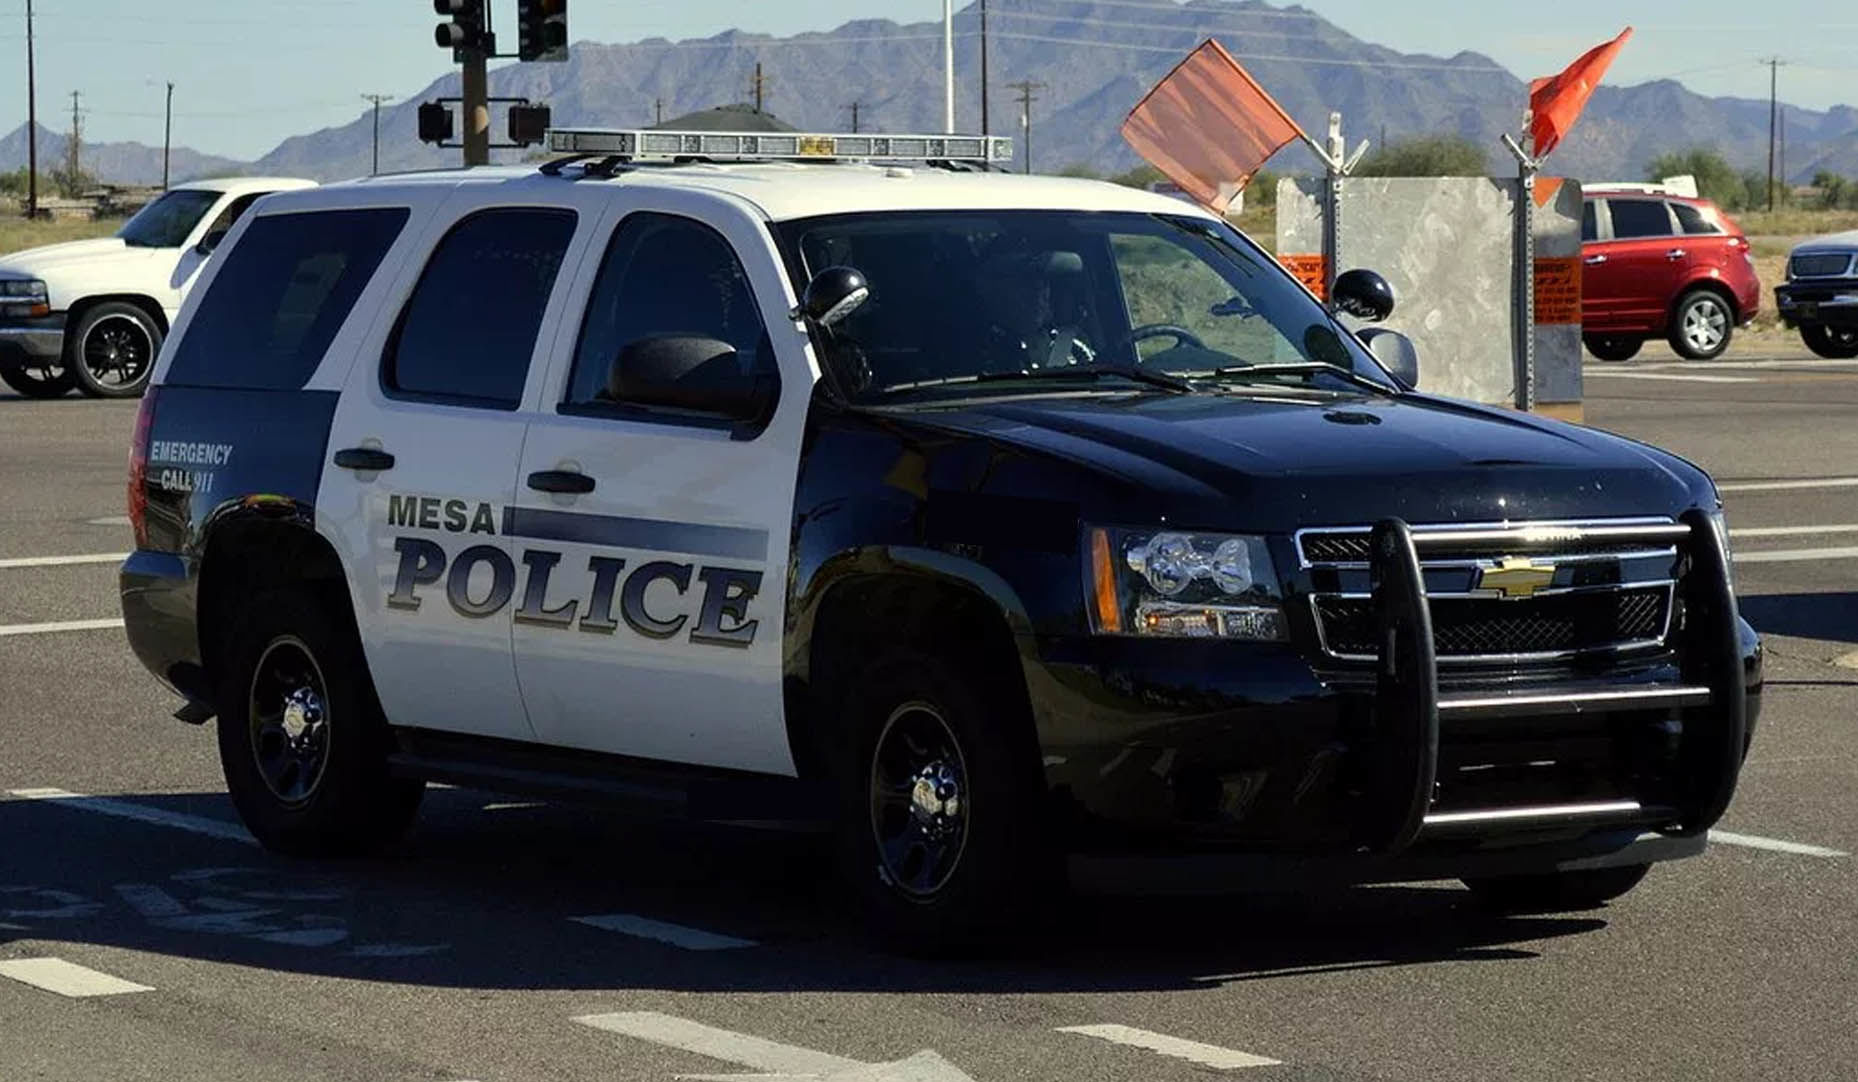 City confirms FBI probe of Mesa police shootings, beatings | East Valley Tribune